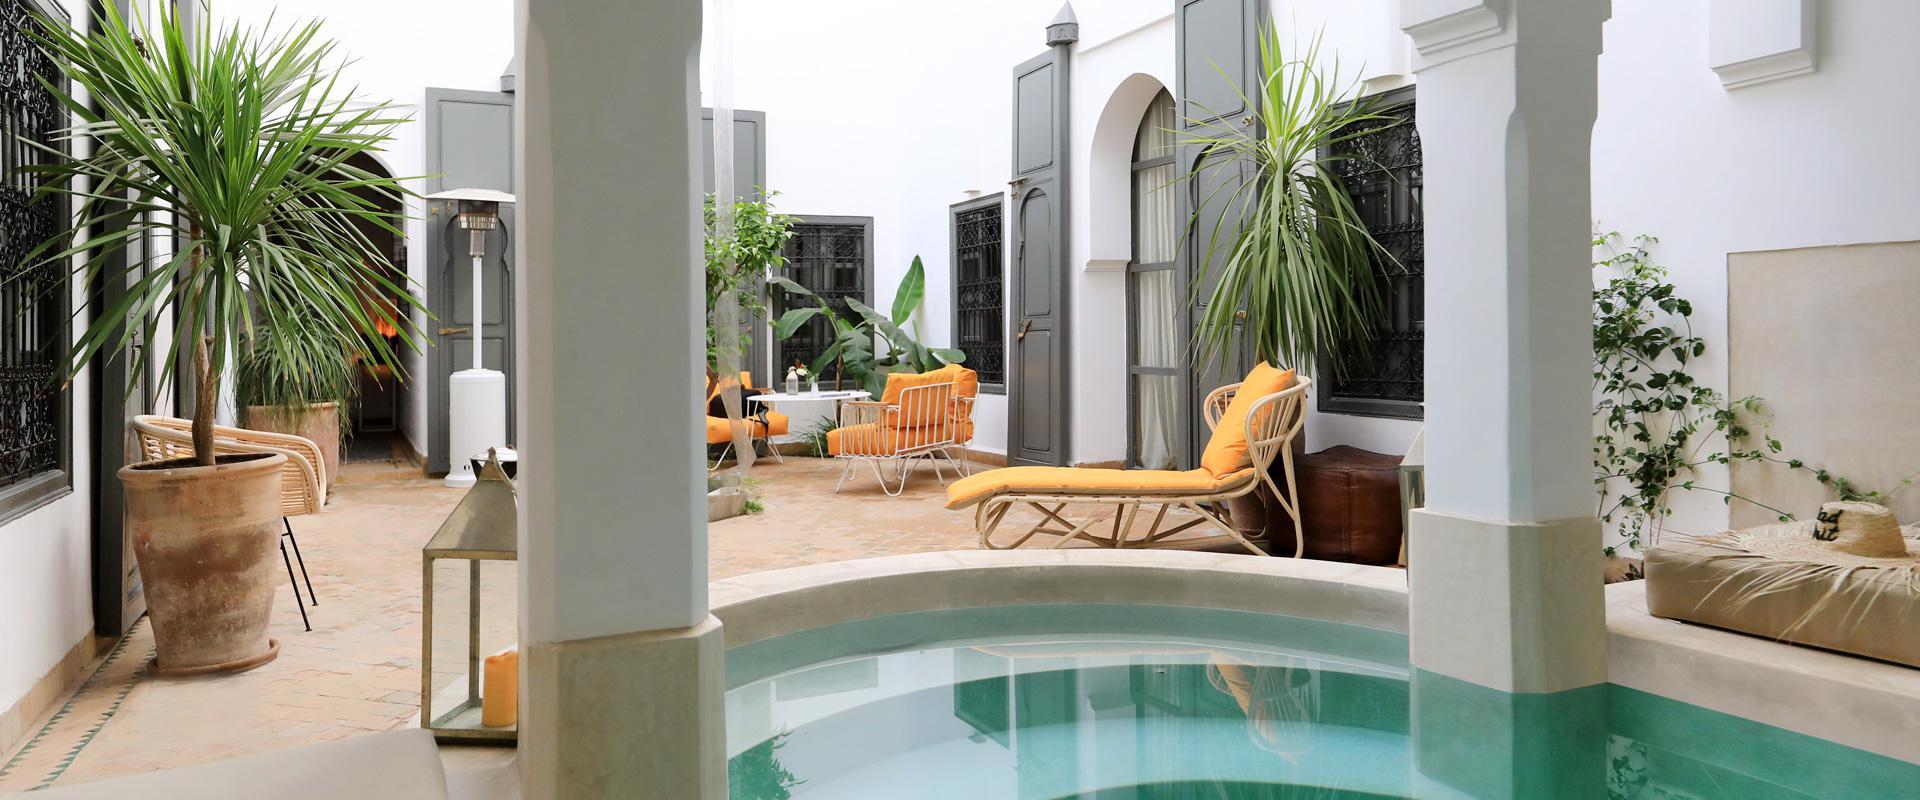 Dar Titrit Marrakech - Site Officiel à Riad Marrakech Avec Piscine